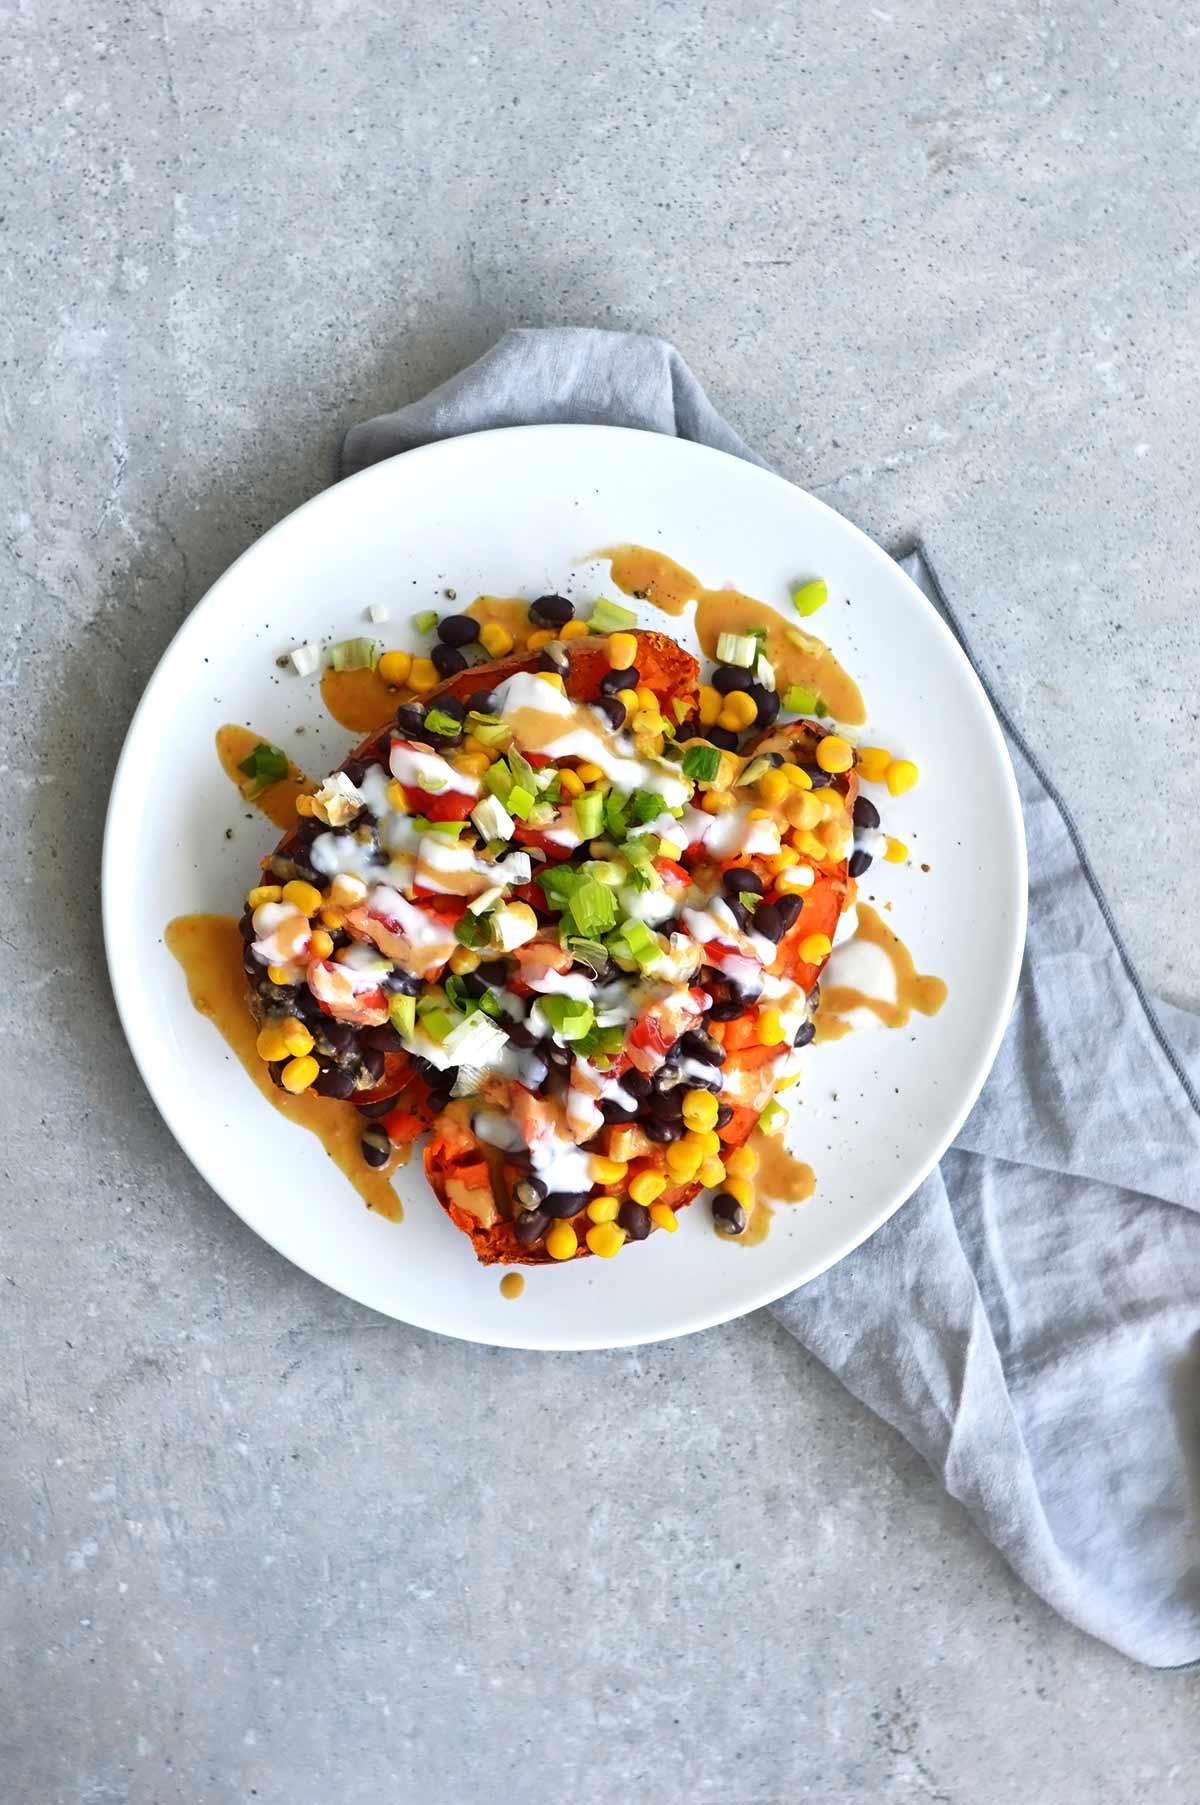 boniatos rellenos veganos en un plato blanco